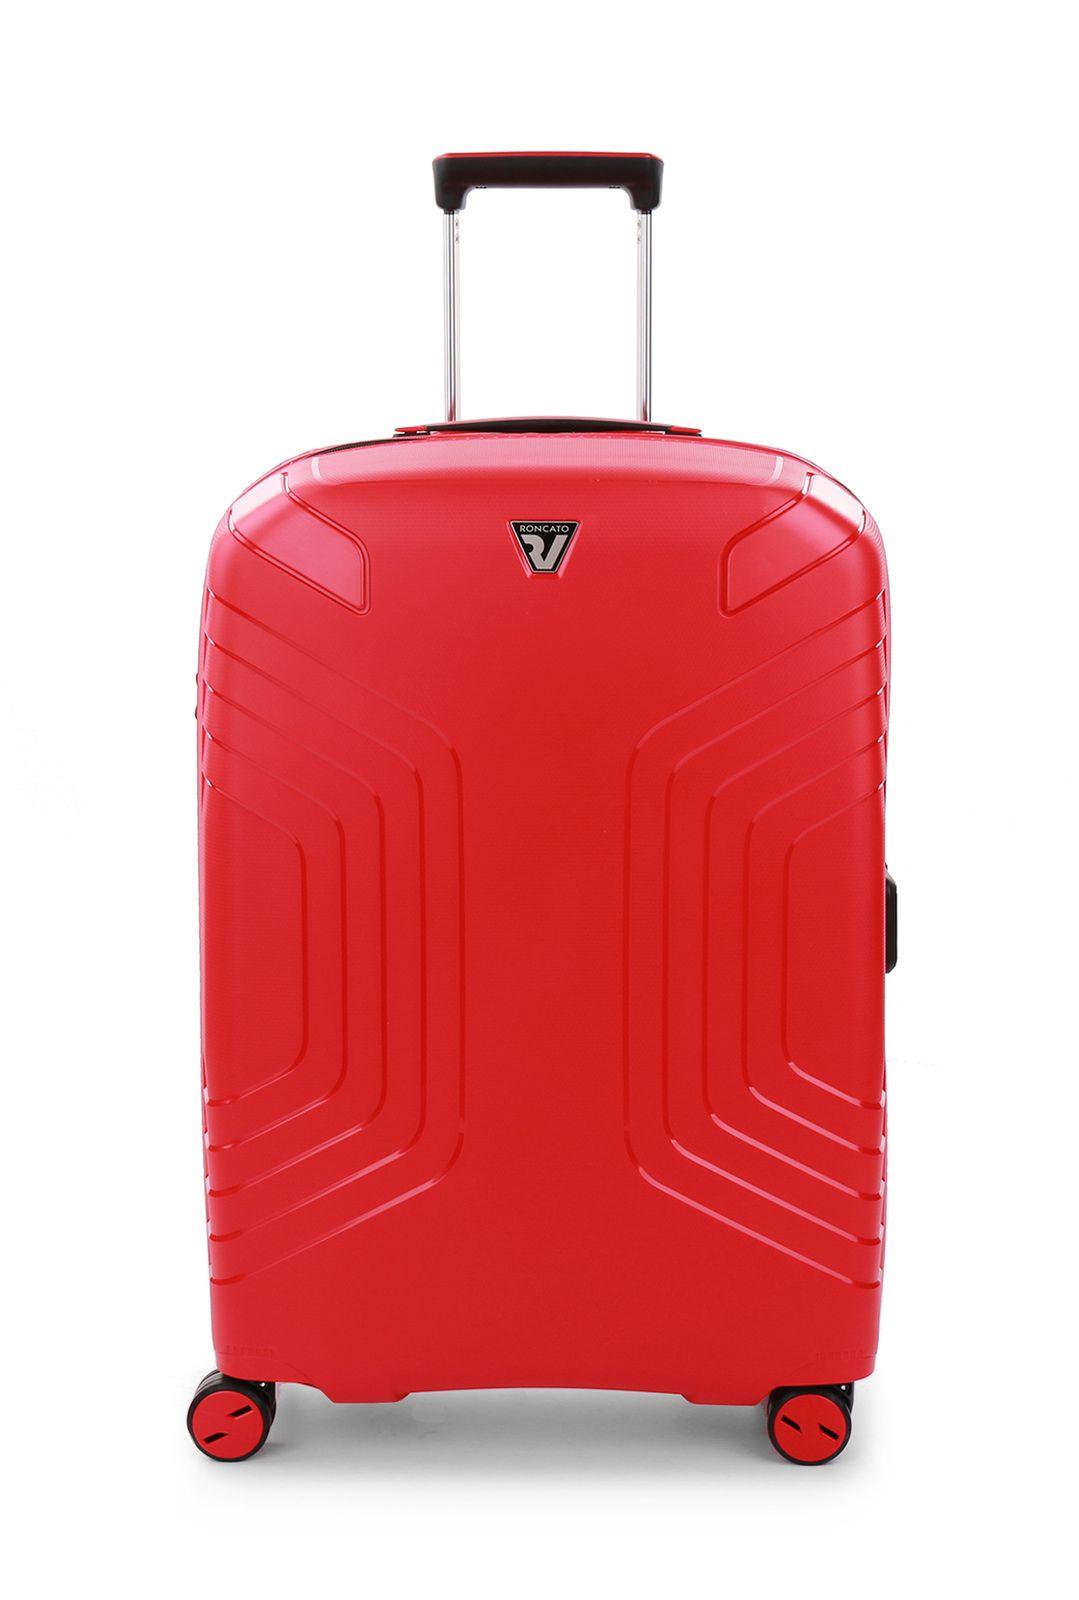 RONCATO Ypsilon Medium Luggage M Red